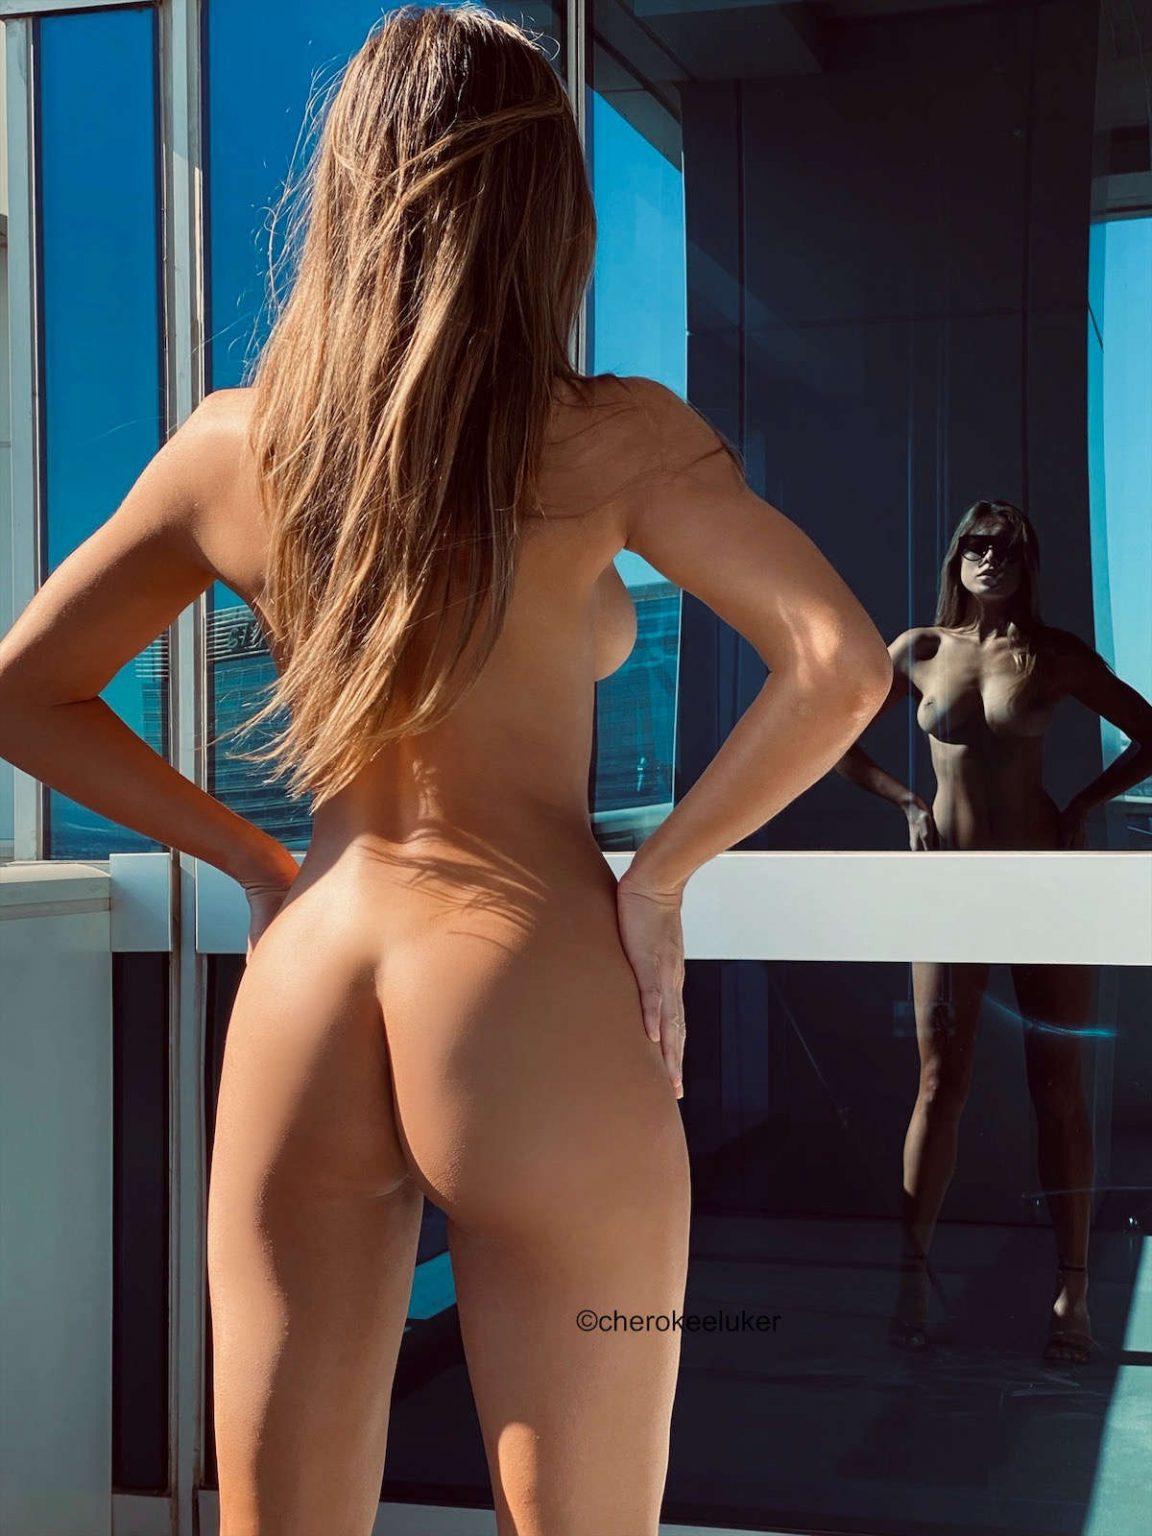 Fit-Naked-Girls-com-Cherokee-Luker-nude-fit-24-1152x1536